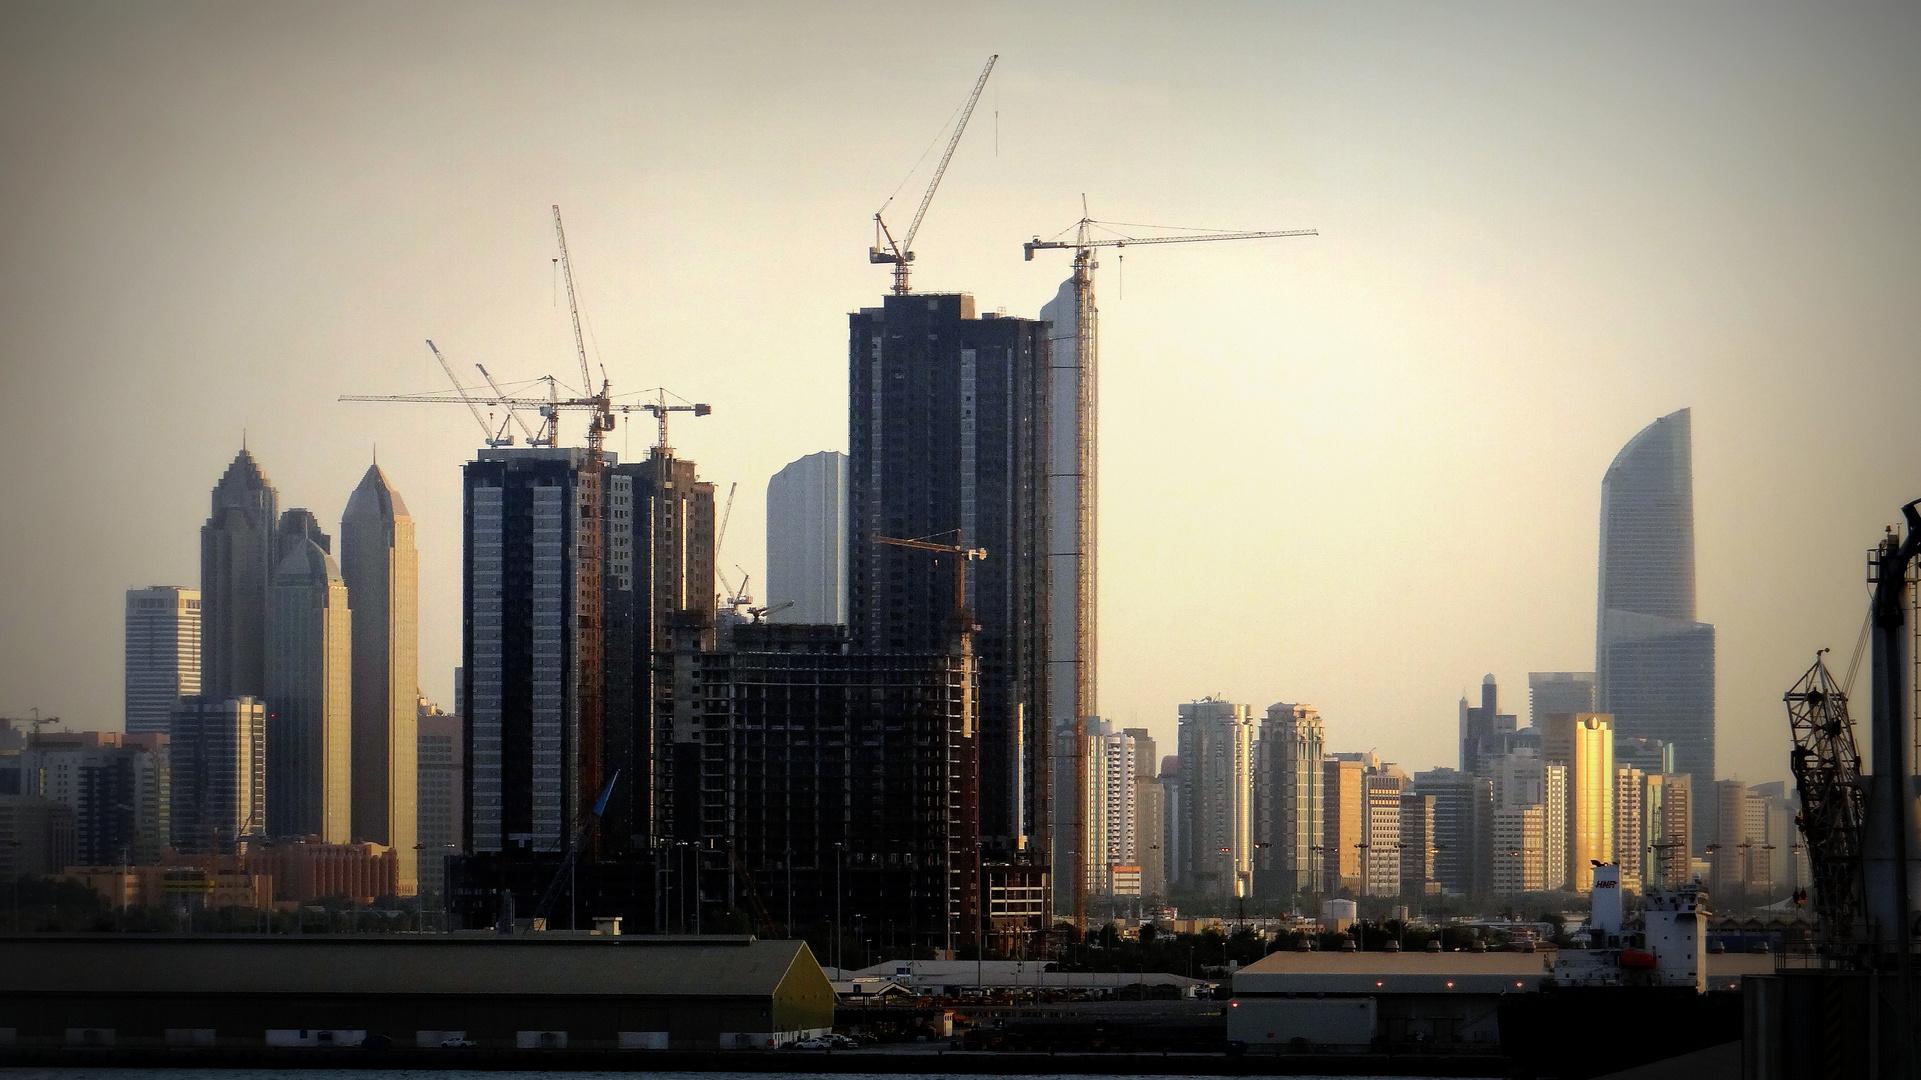 Boomtown Abu Dhabi